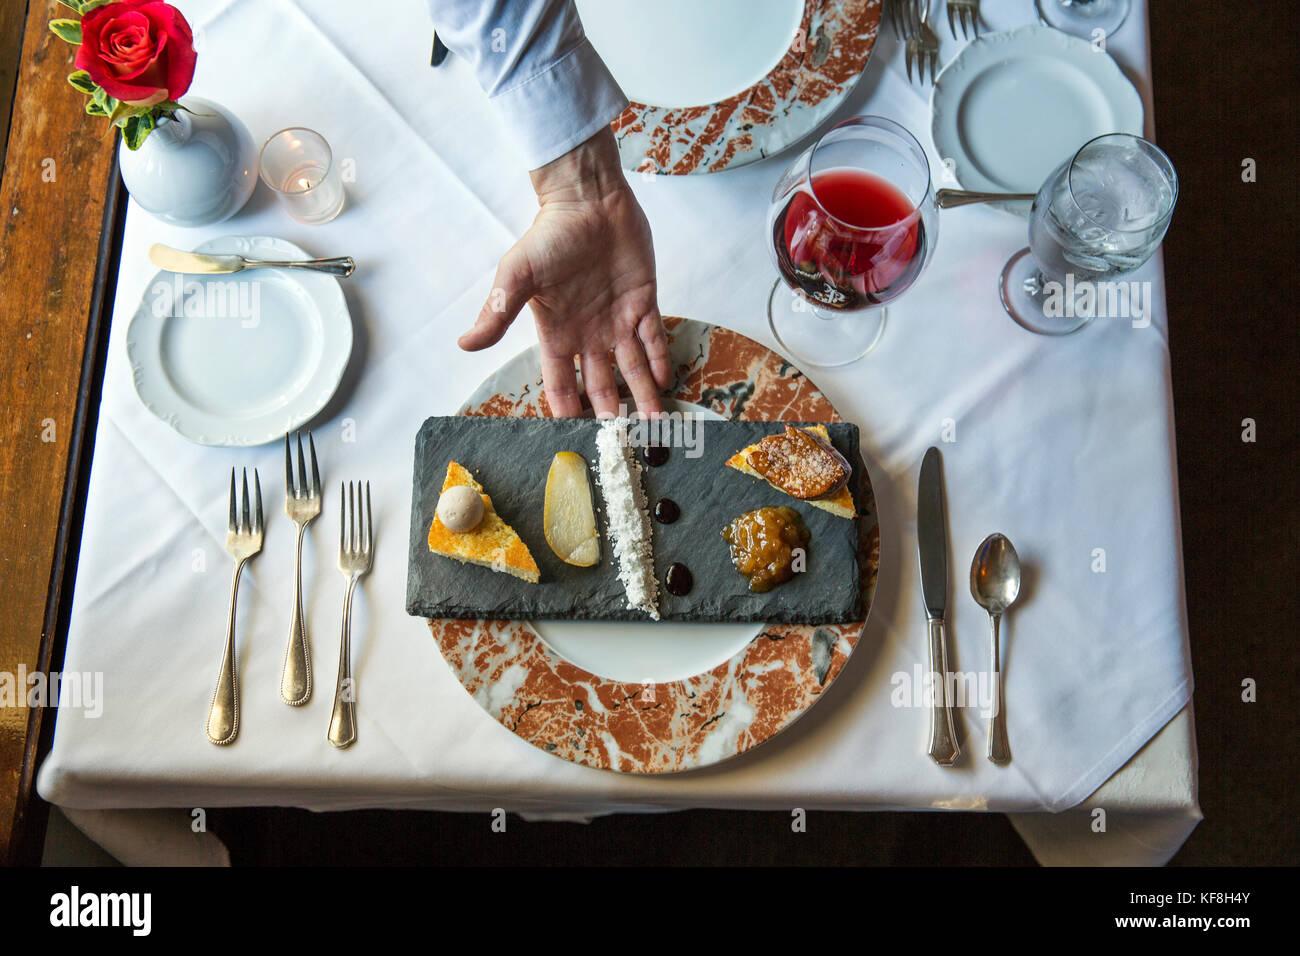 USA, Oregon, Willamette Valley, the Joel Palmer House Restaurant, Dayton, Foie Gras Two Ways, quince glaze, poached - Stock Image